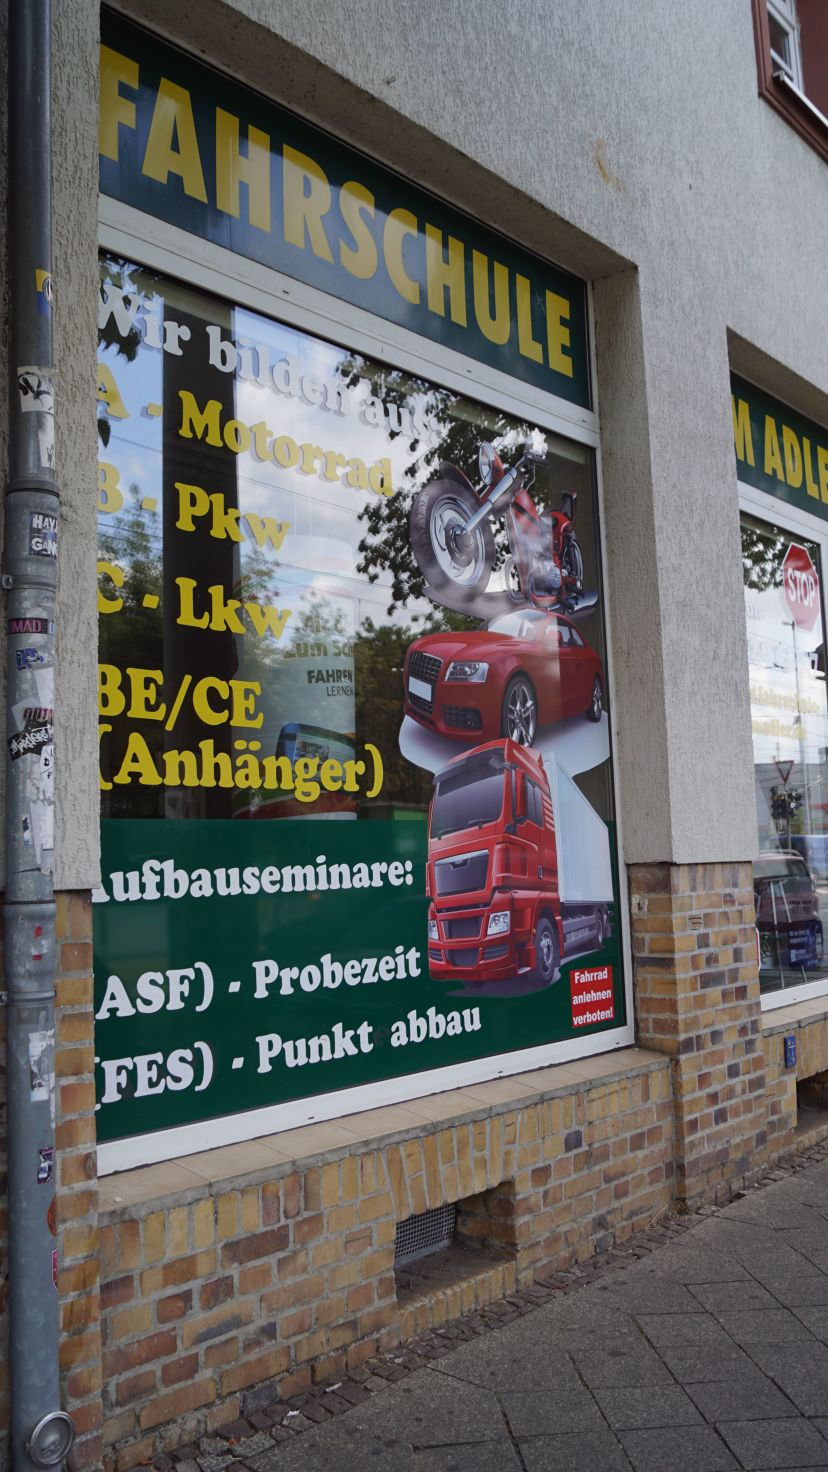 Fahrschule Am Adler A&K GmbH Schleußig 2